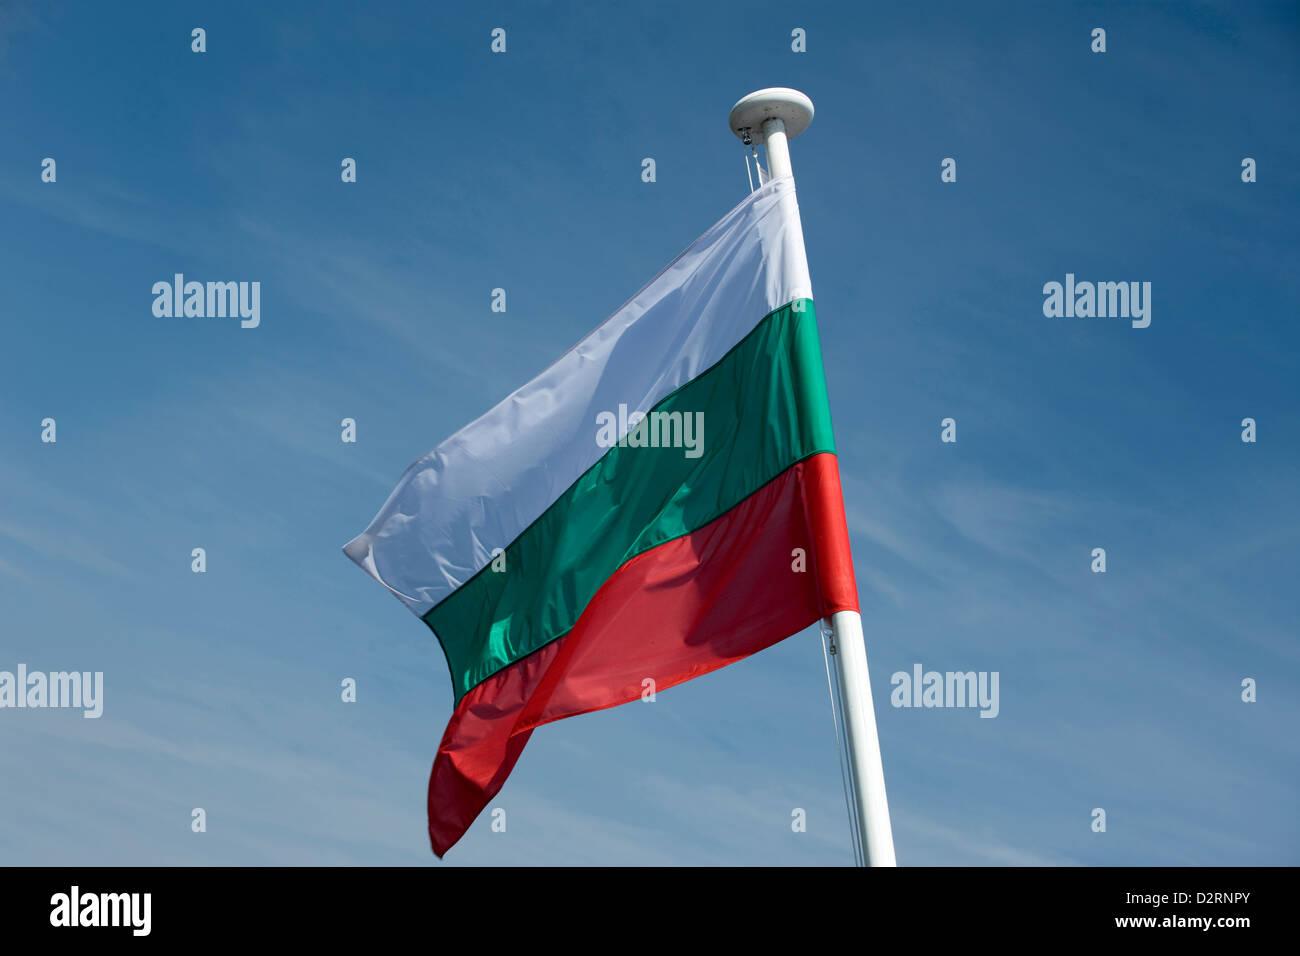 BULGARIAN FLAG FLYING ON FLAGPOLE - Stock Image